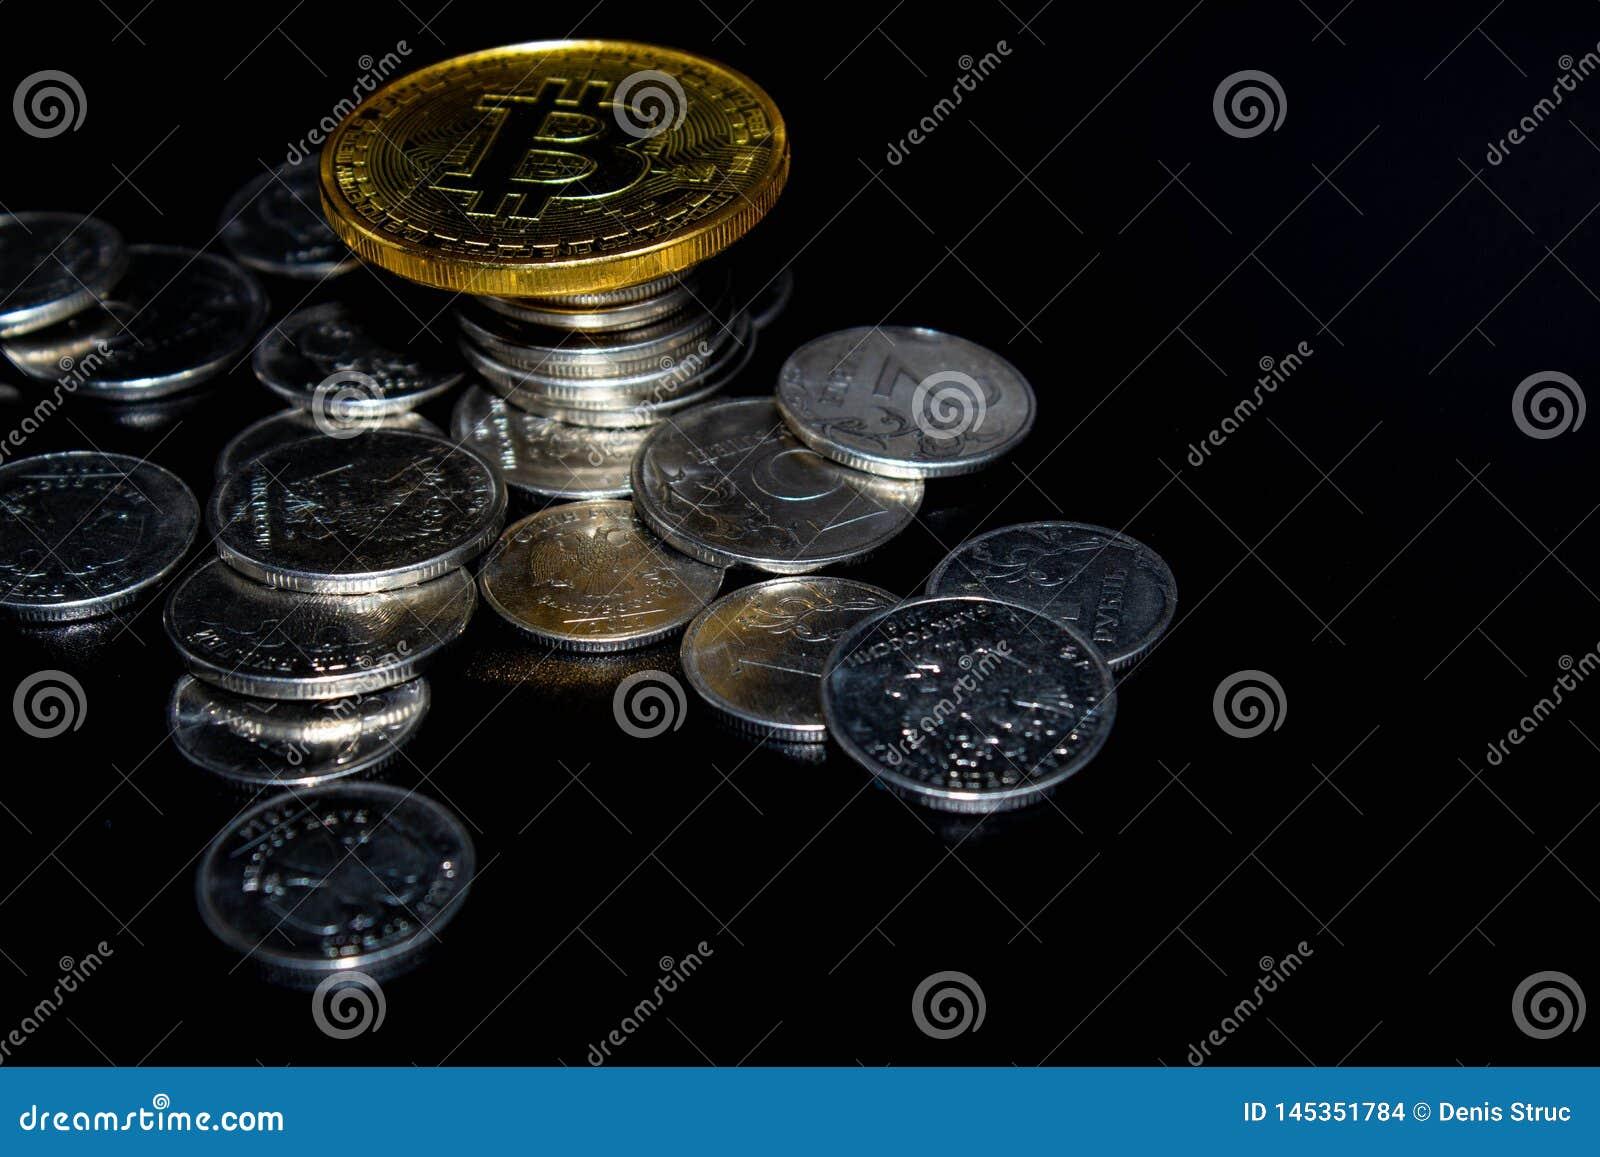 Golden Bitcoin on a black background, money